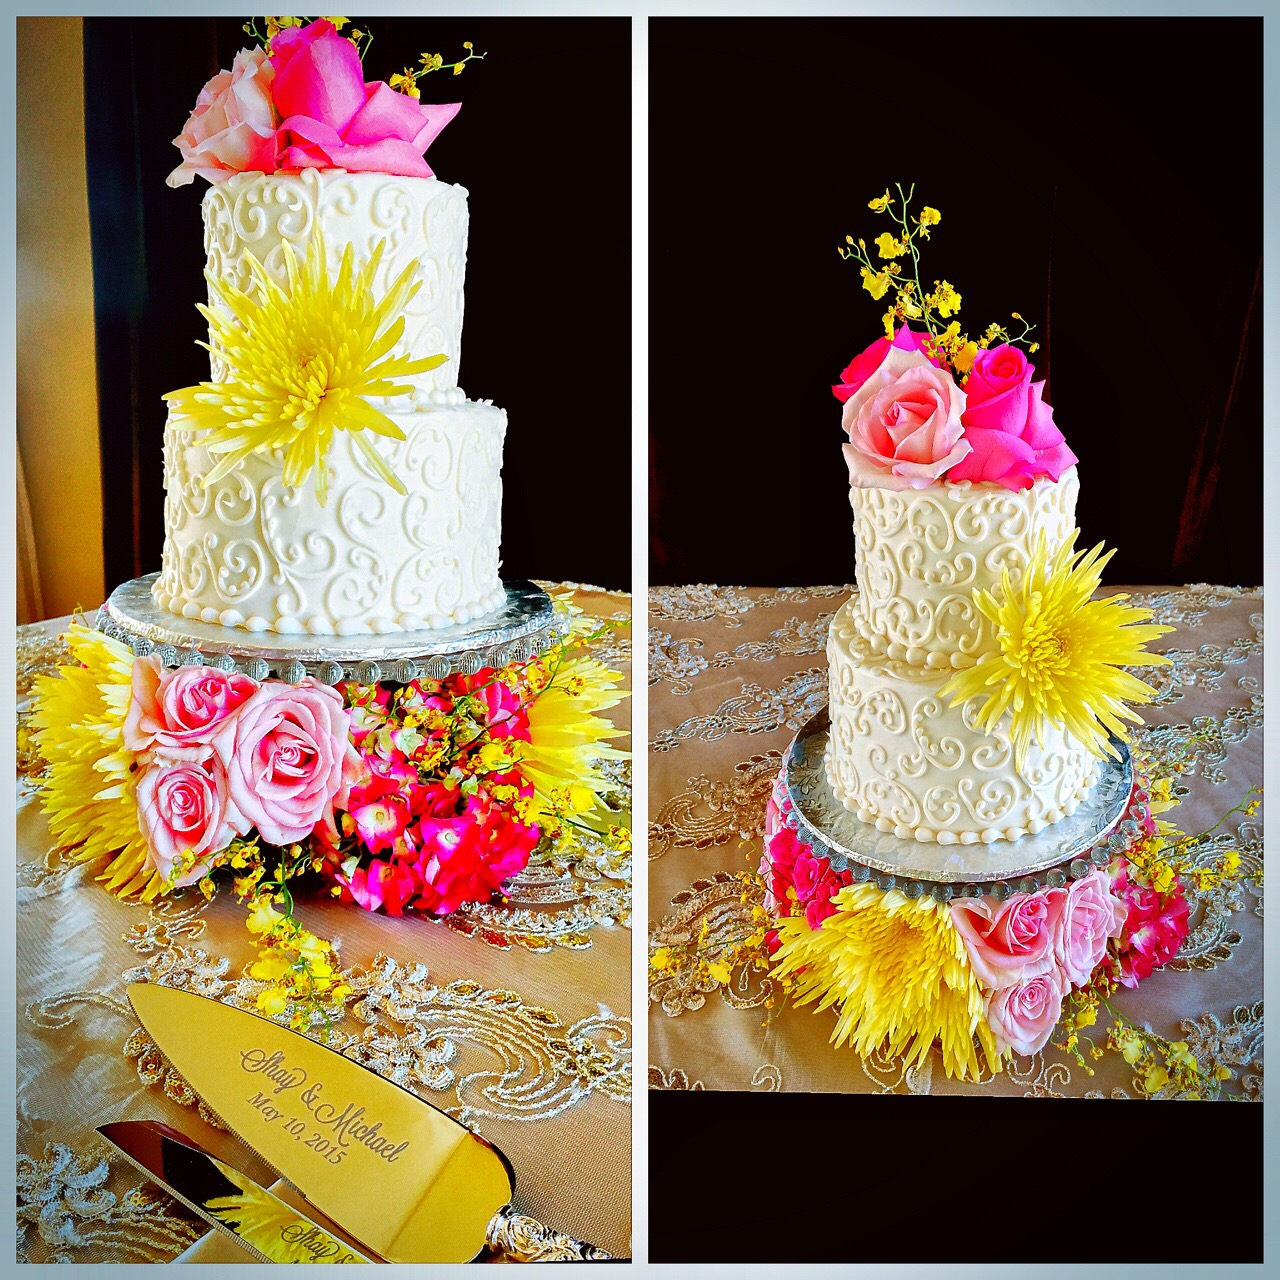 las vegas wedding videographers, memory lane video, lake club, wedding cakes, green orchid events,